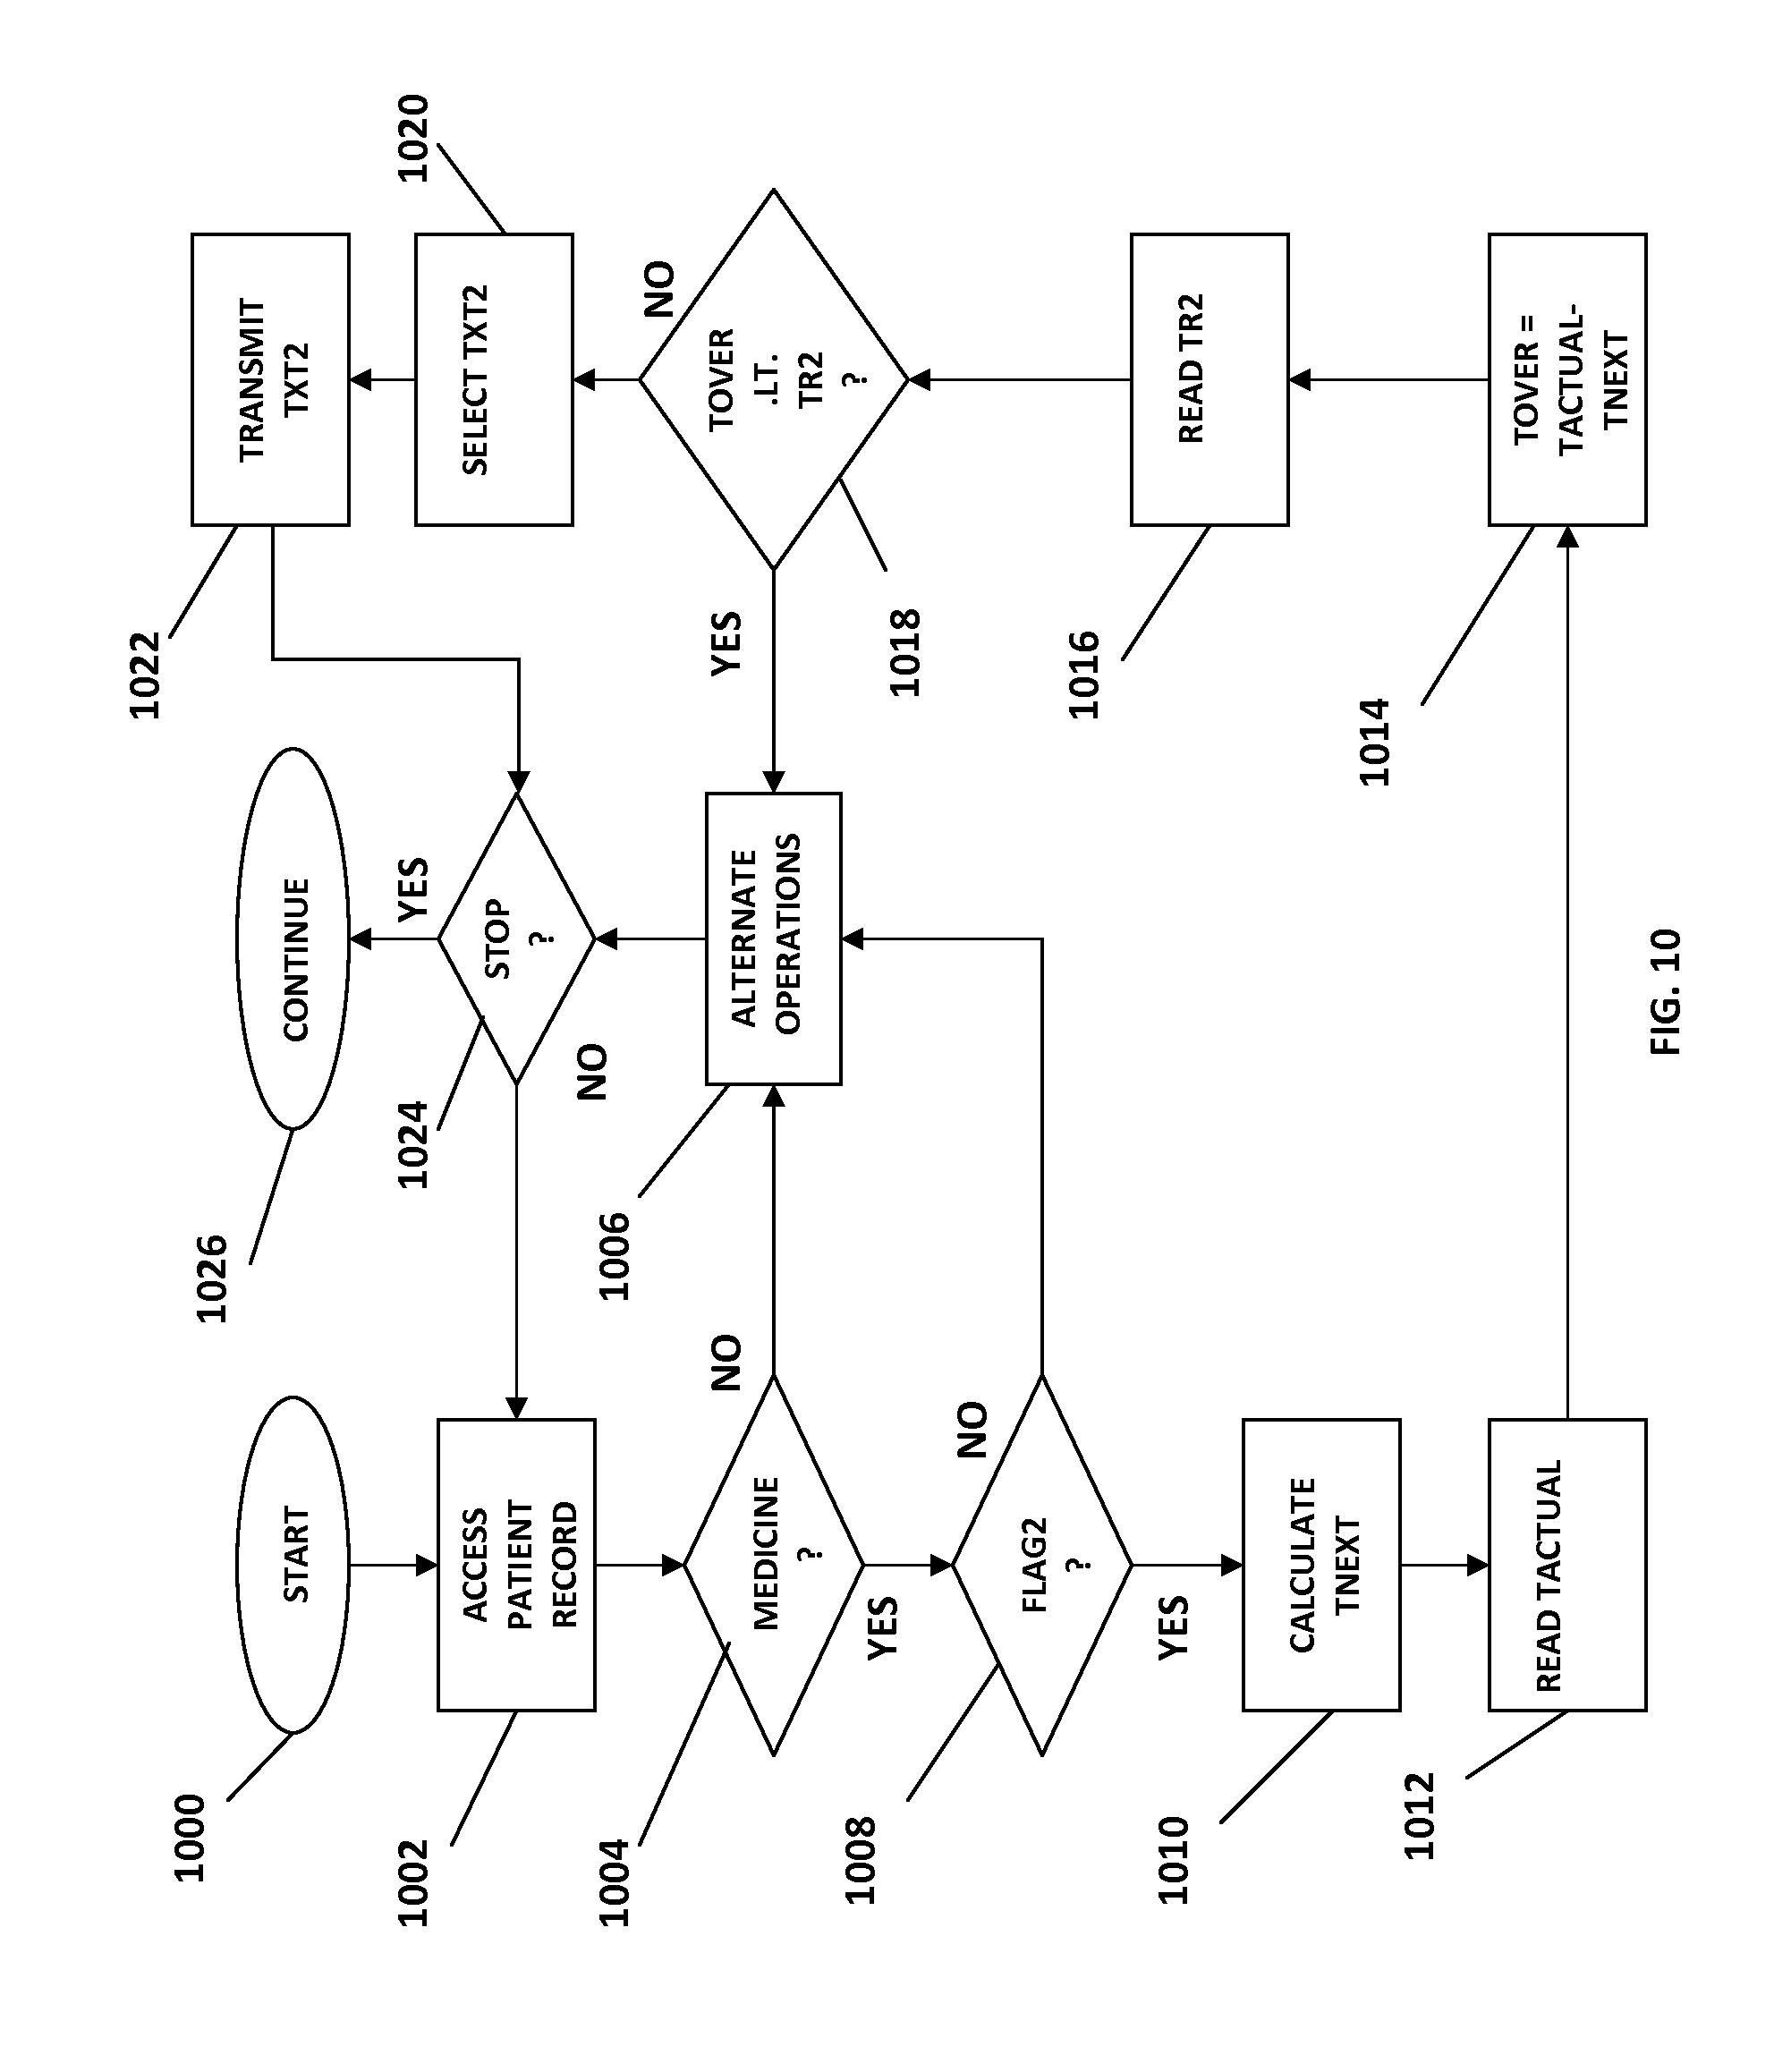 Patent Us 9883819 B2 Techno 4 Circuit Diagram